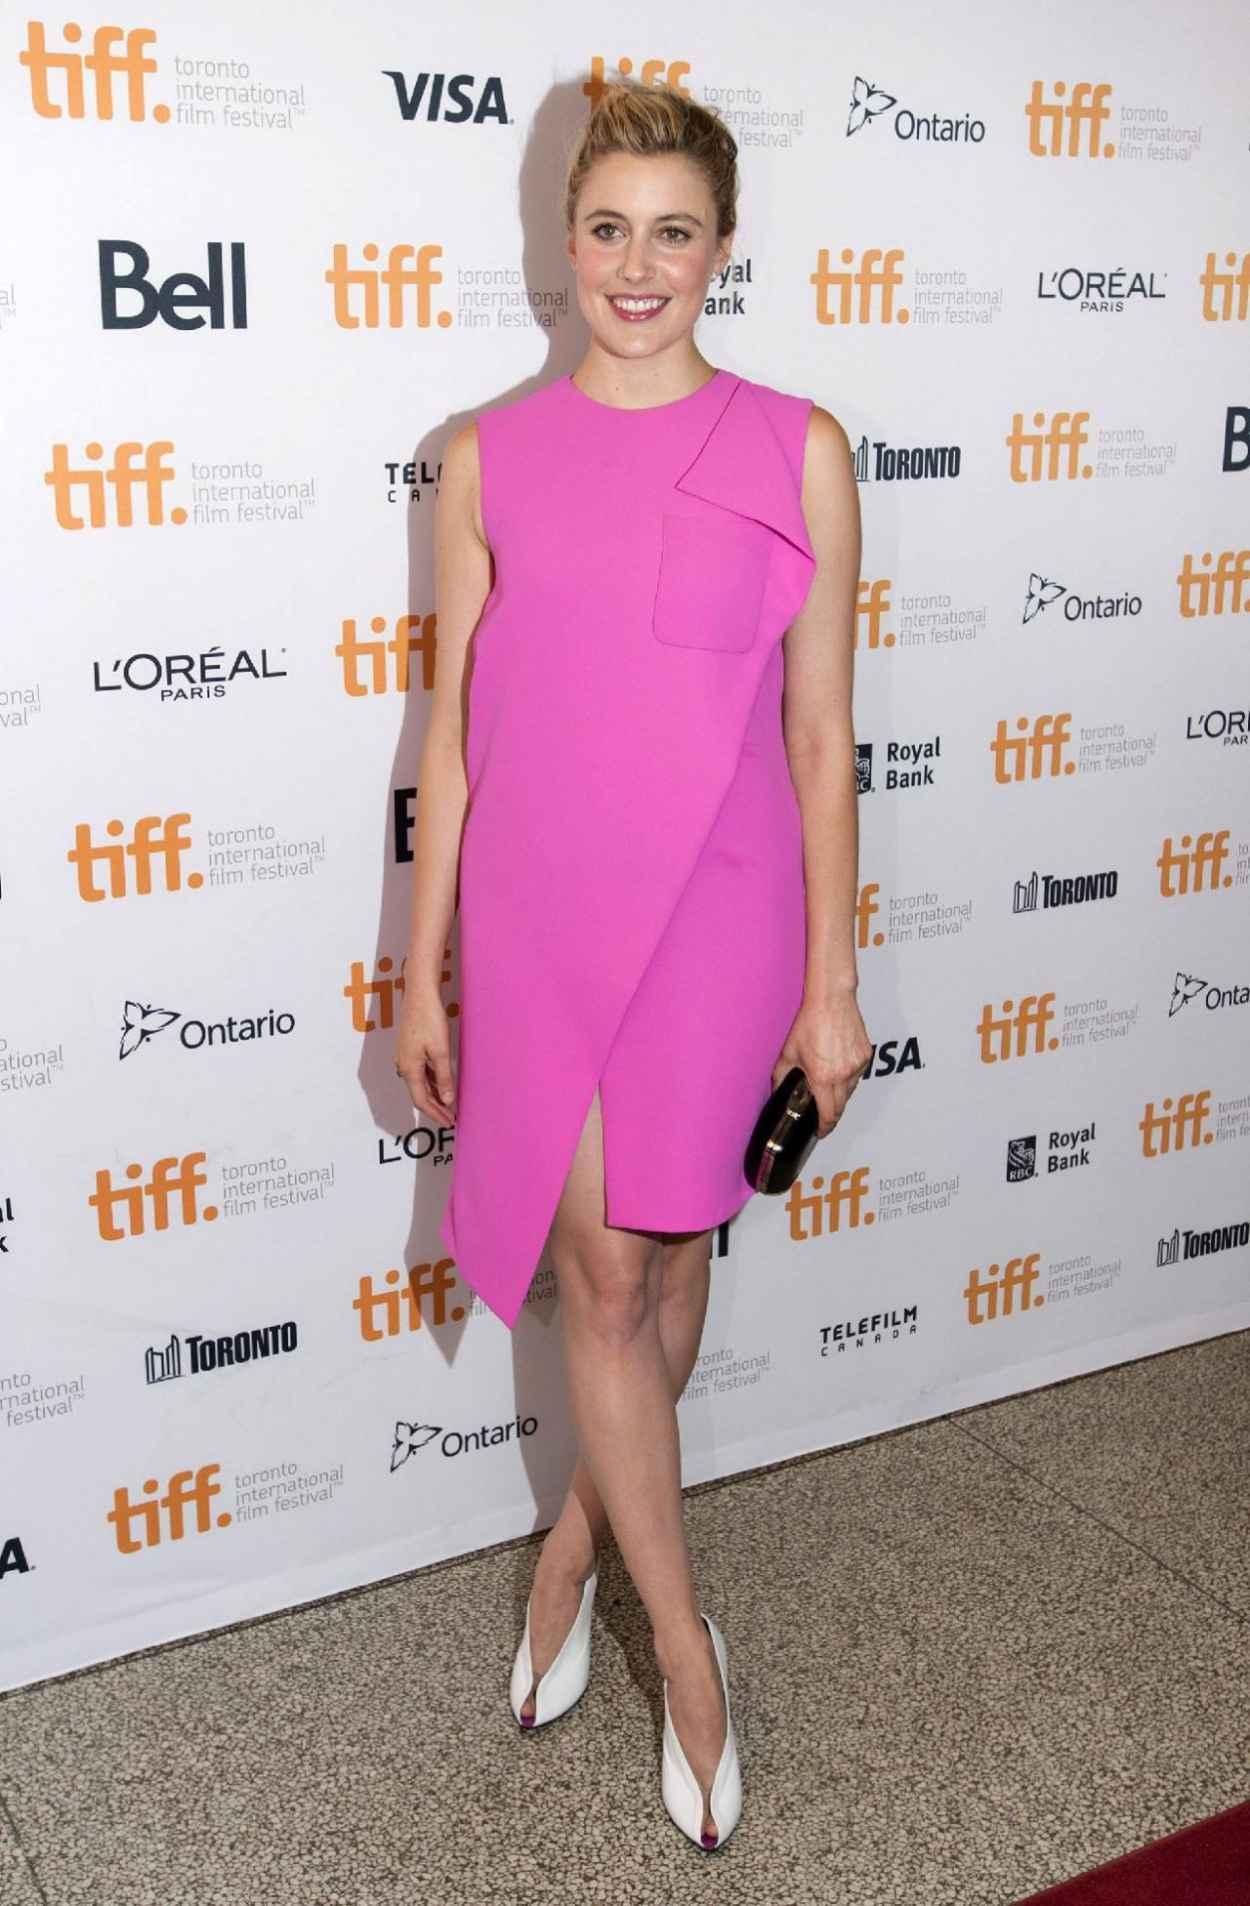 Greta Gerwig - The Humbling Premiere - TIFF 2015-1